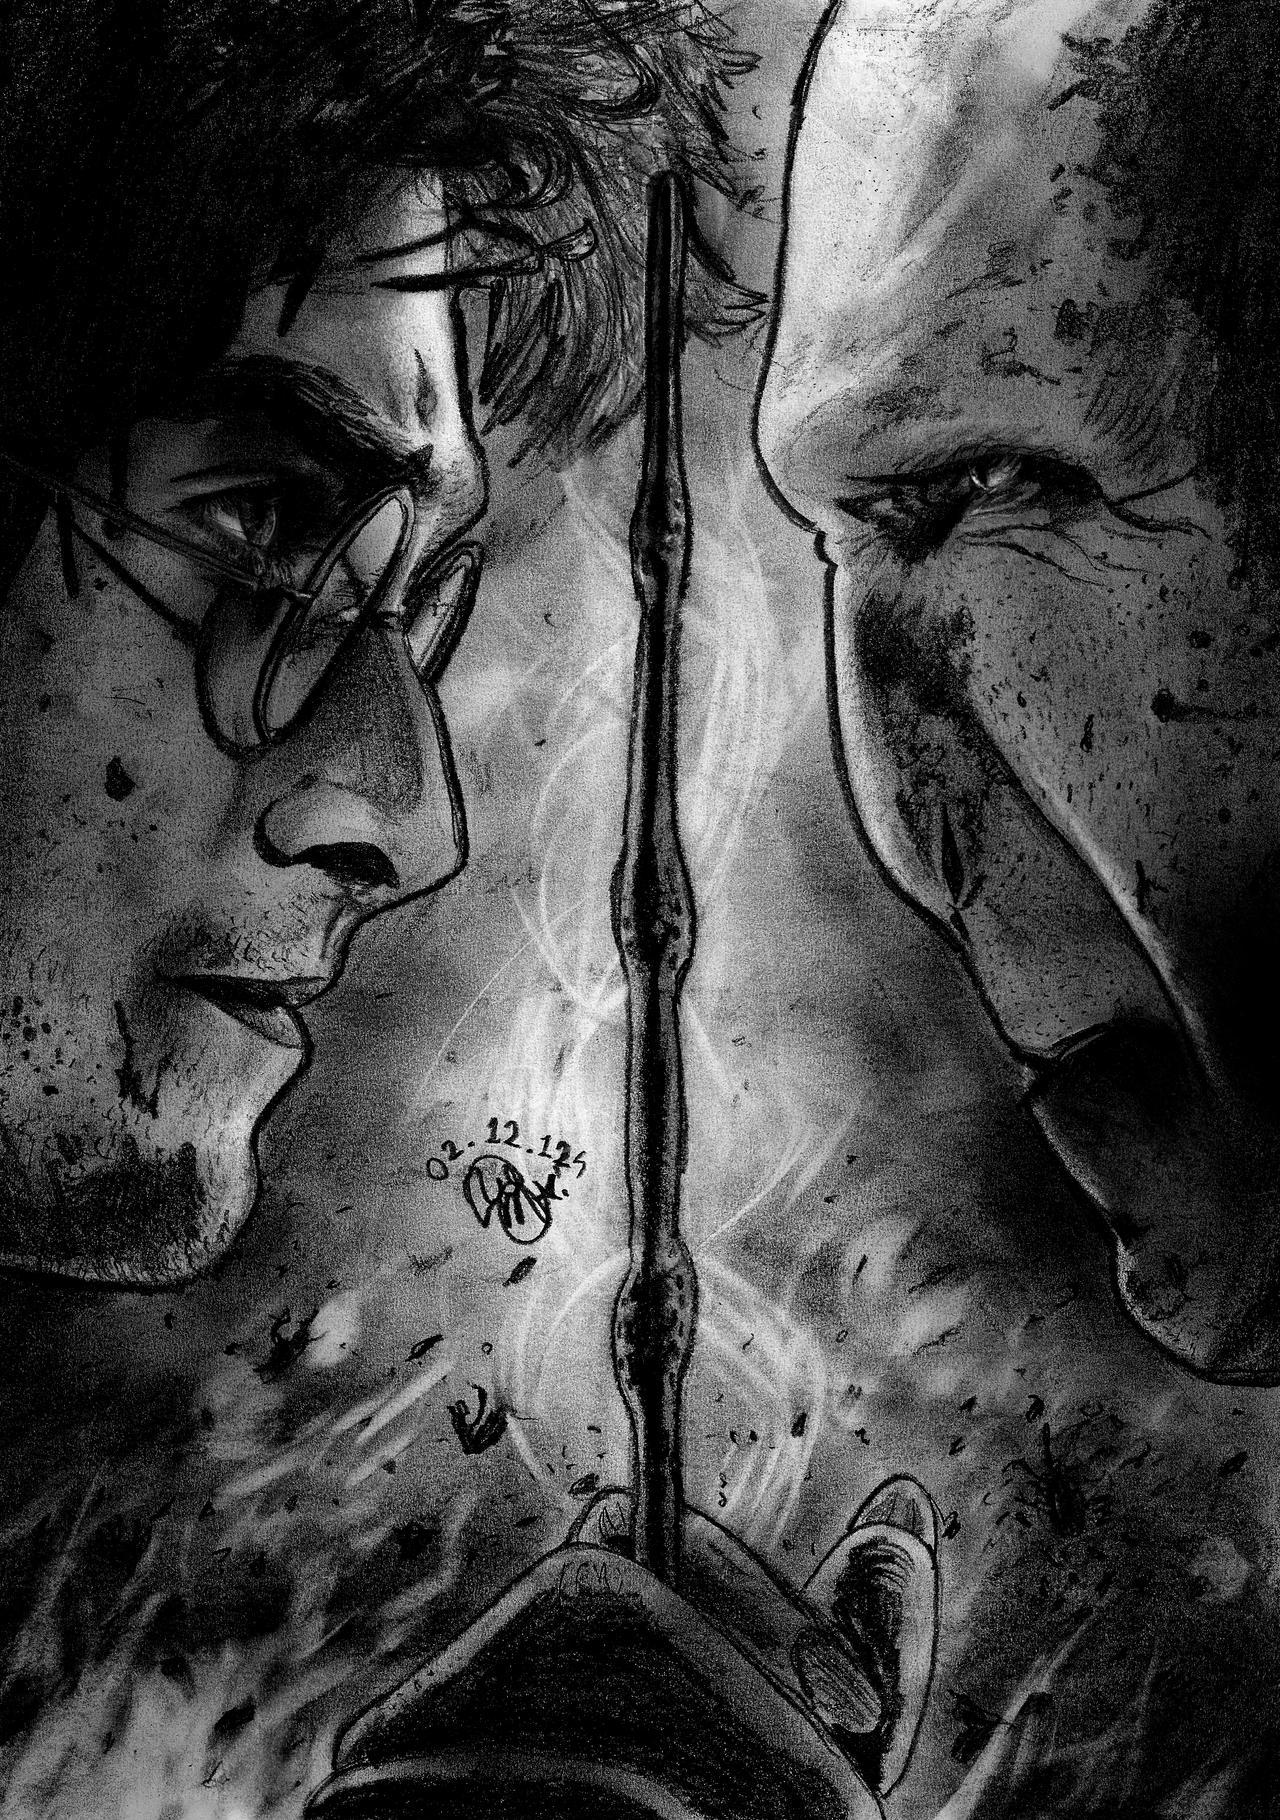 Harry vs Voldemort NEW by Williaaaaaam on deviantART